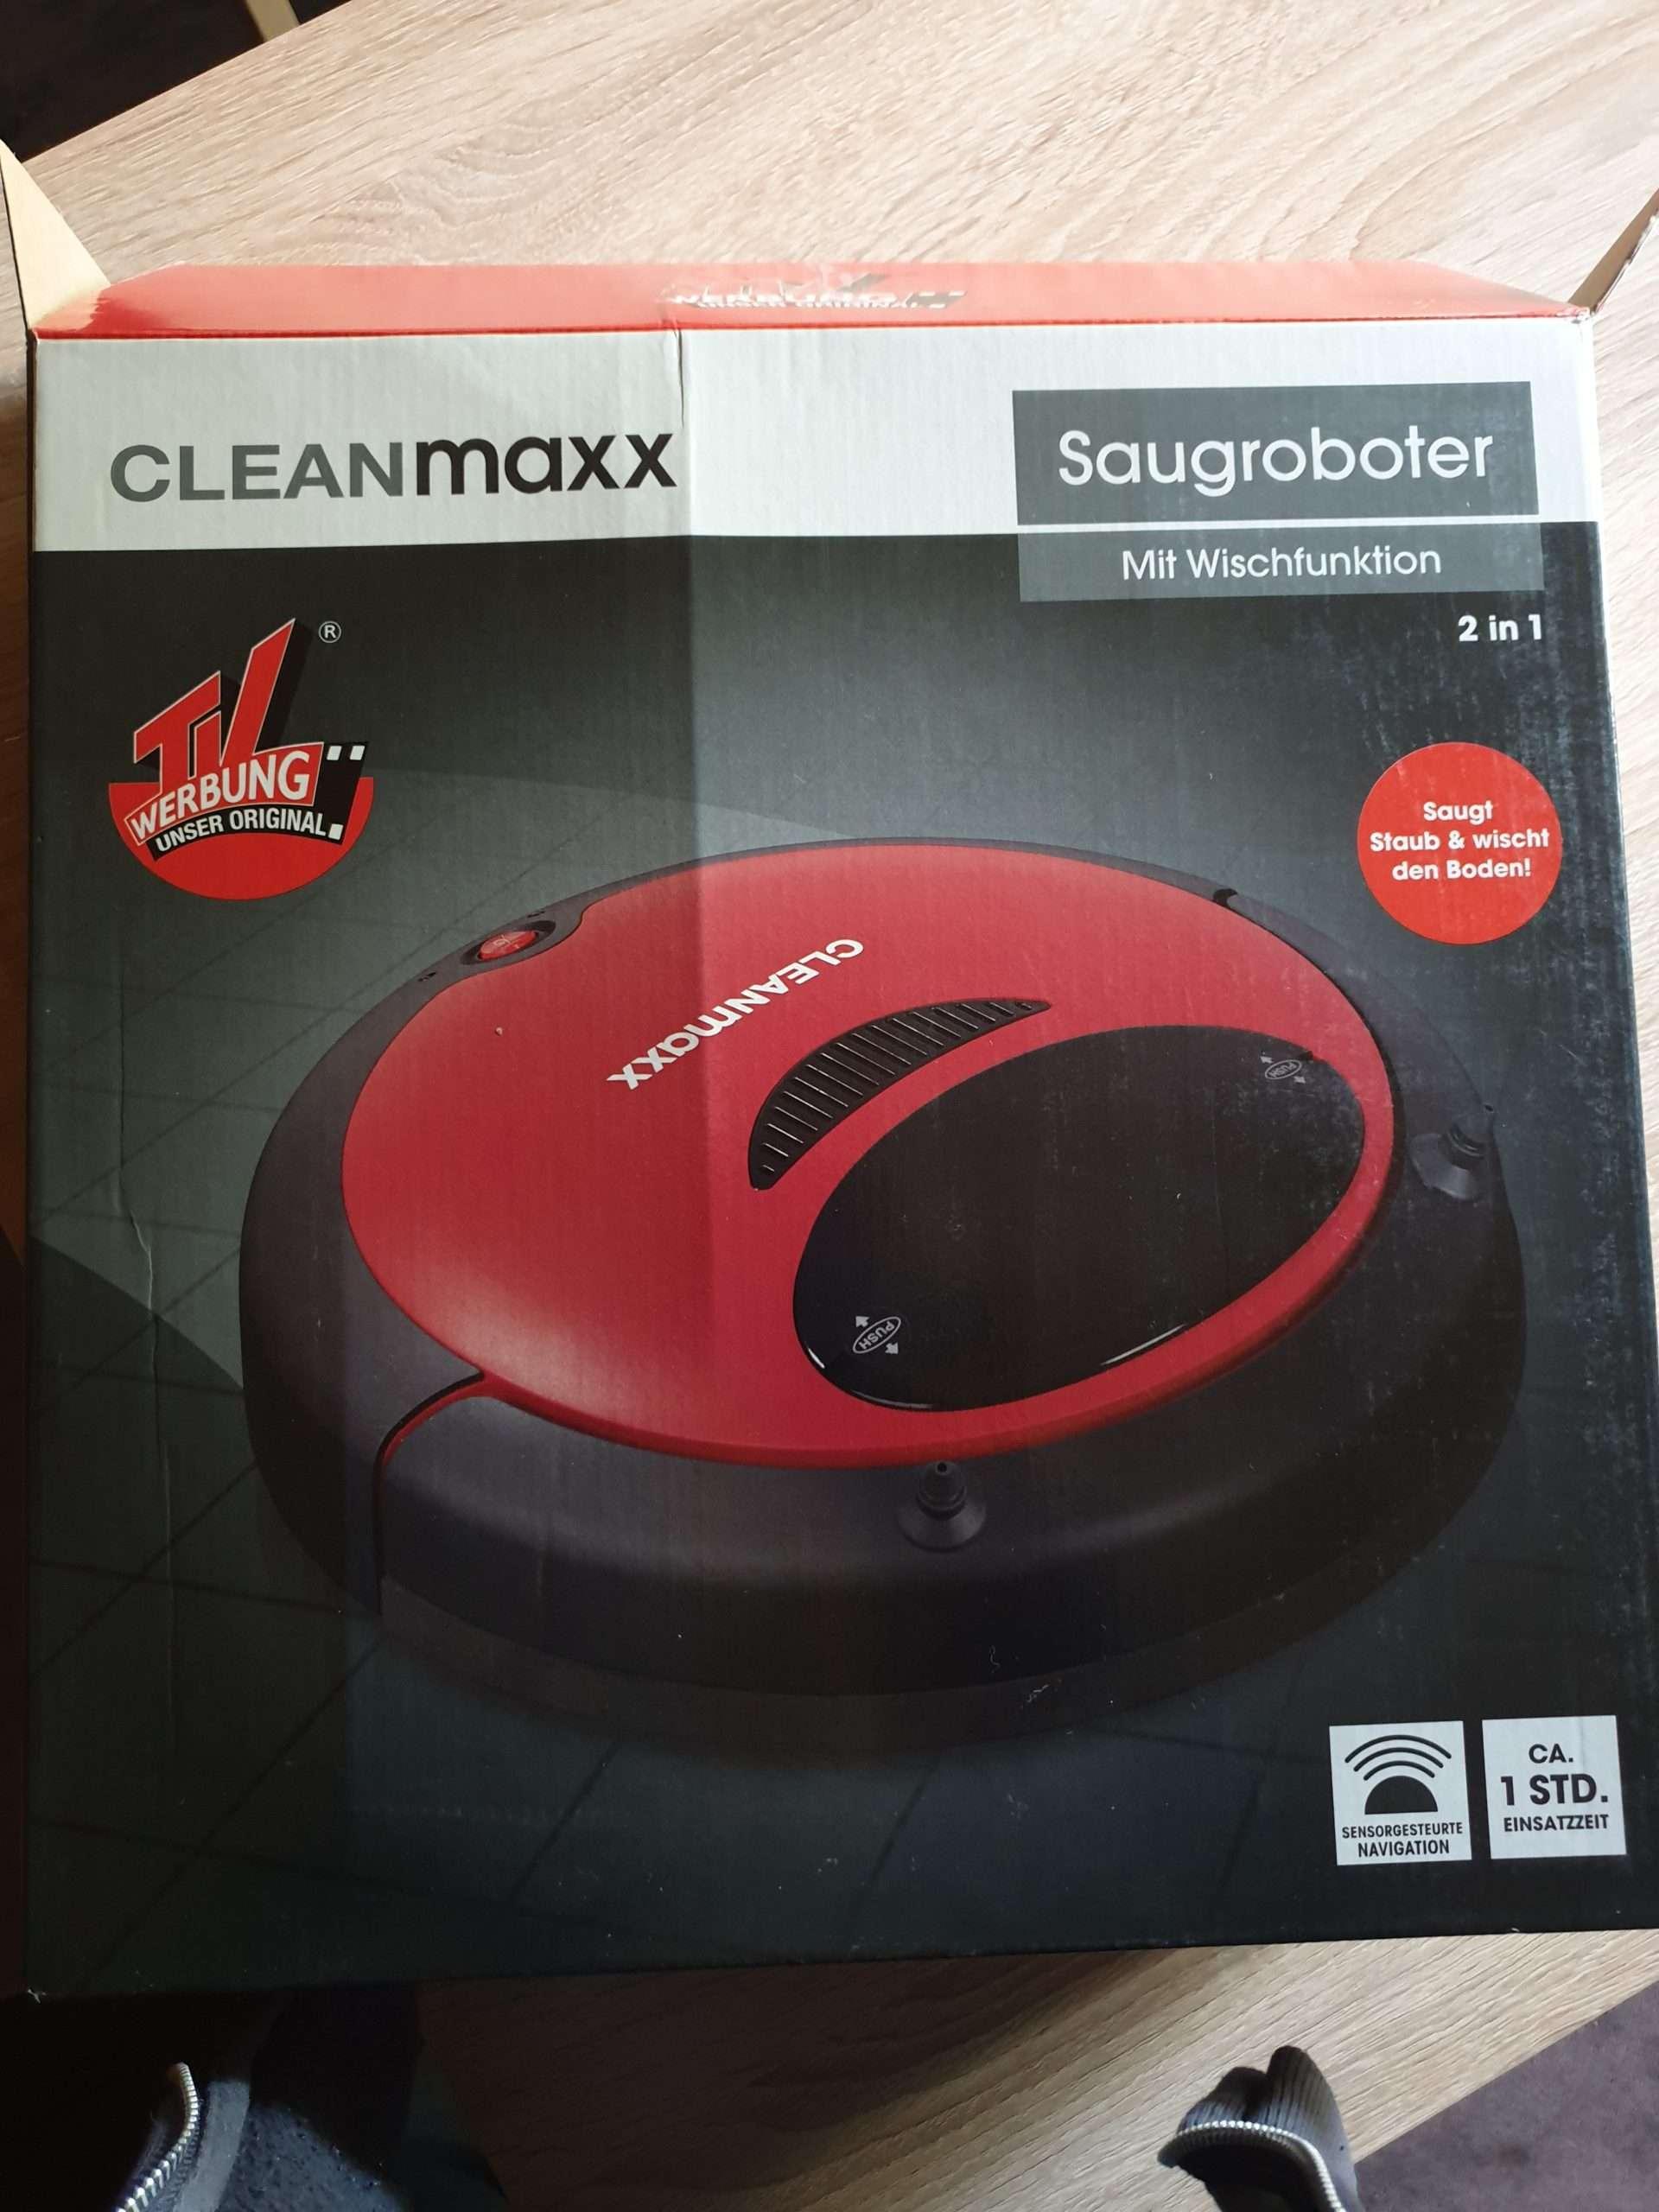 Saugroboter Cleanmaxx im test